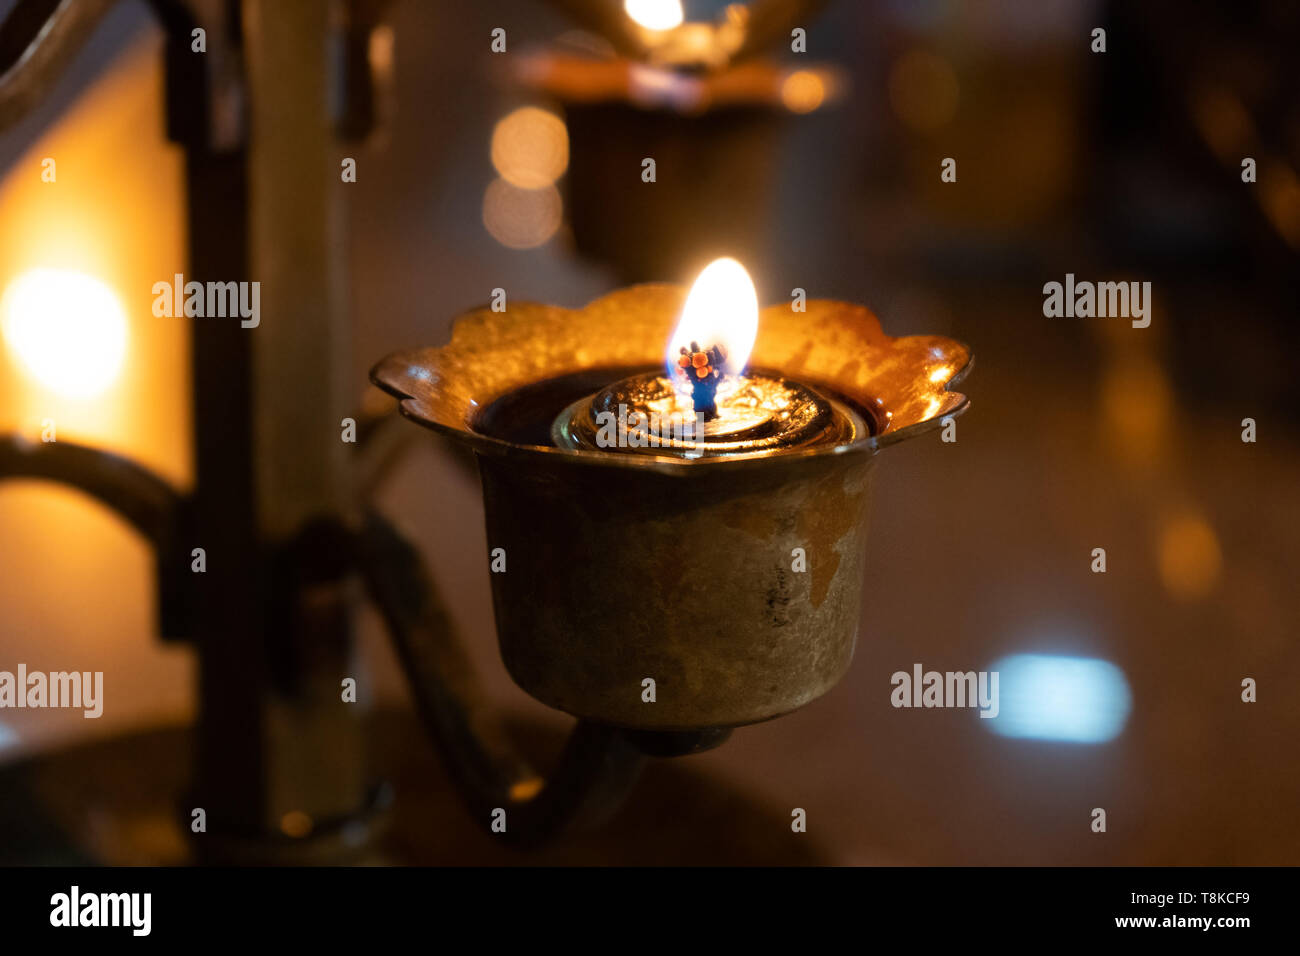 oil lamp at buddhist monastry - Stock Image